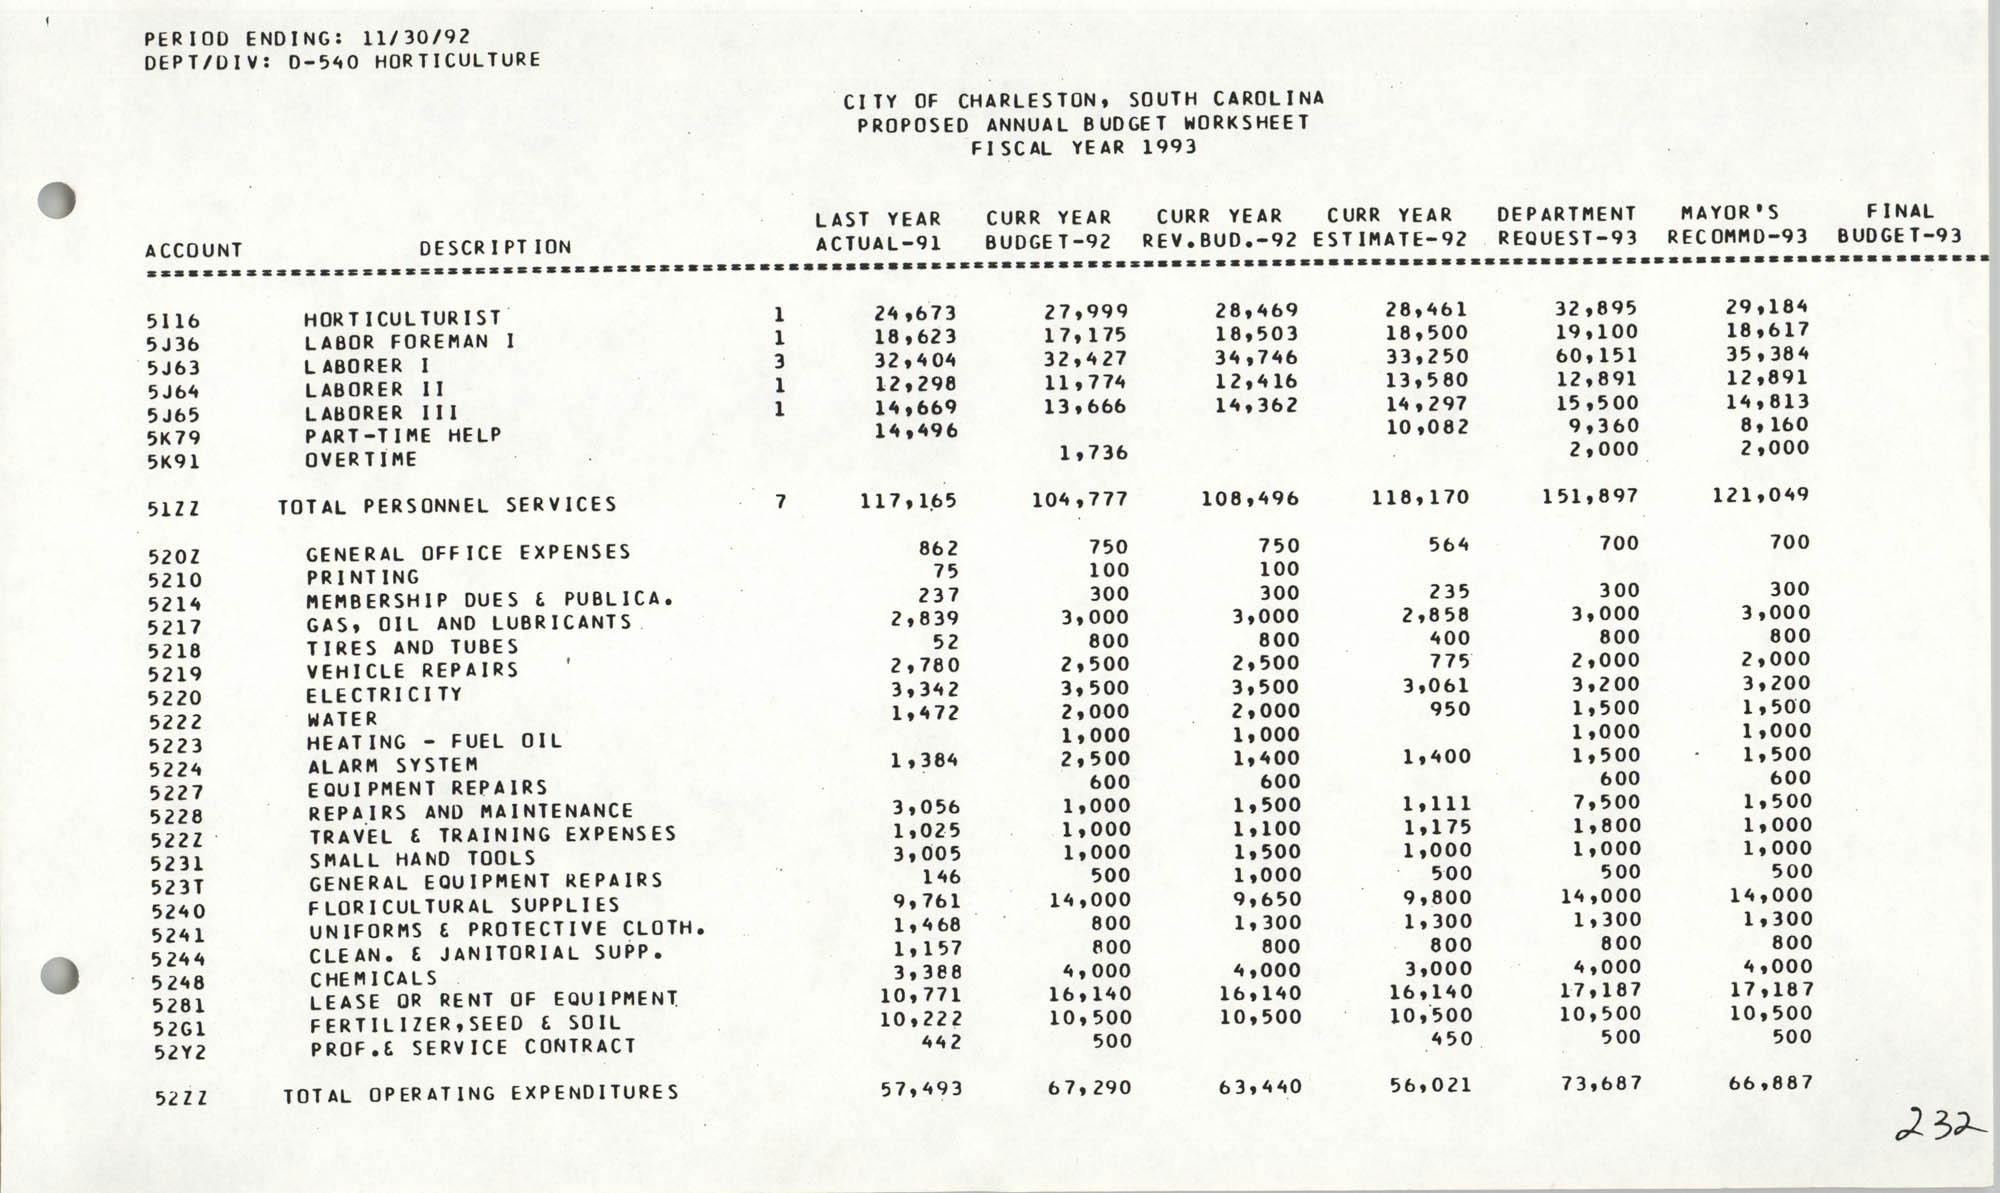 The City Council of Charleston, South Carolina, 1993 Budget, Page 232